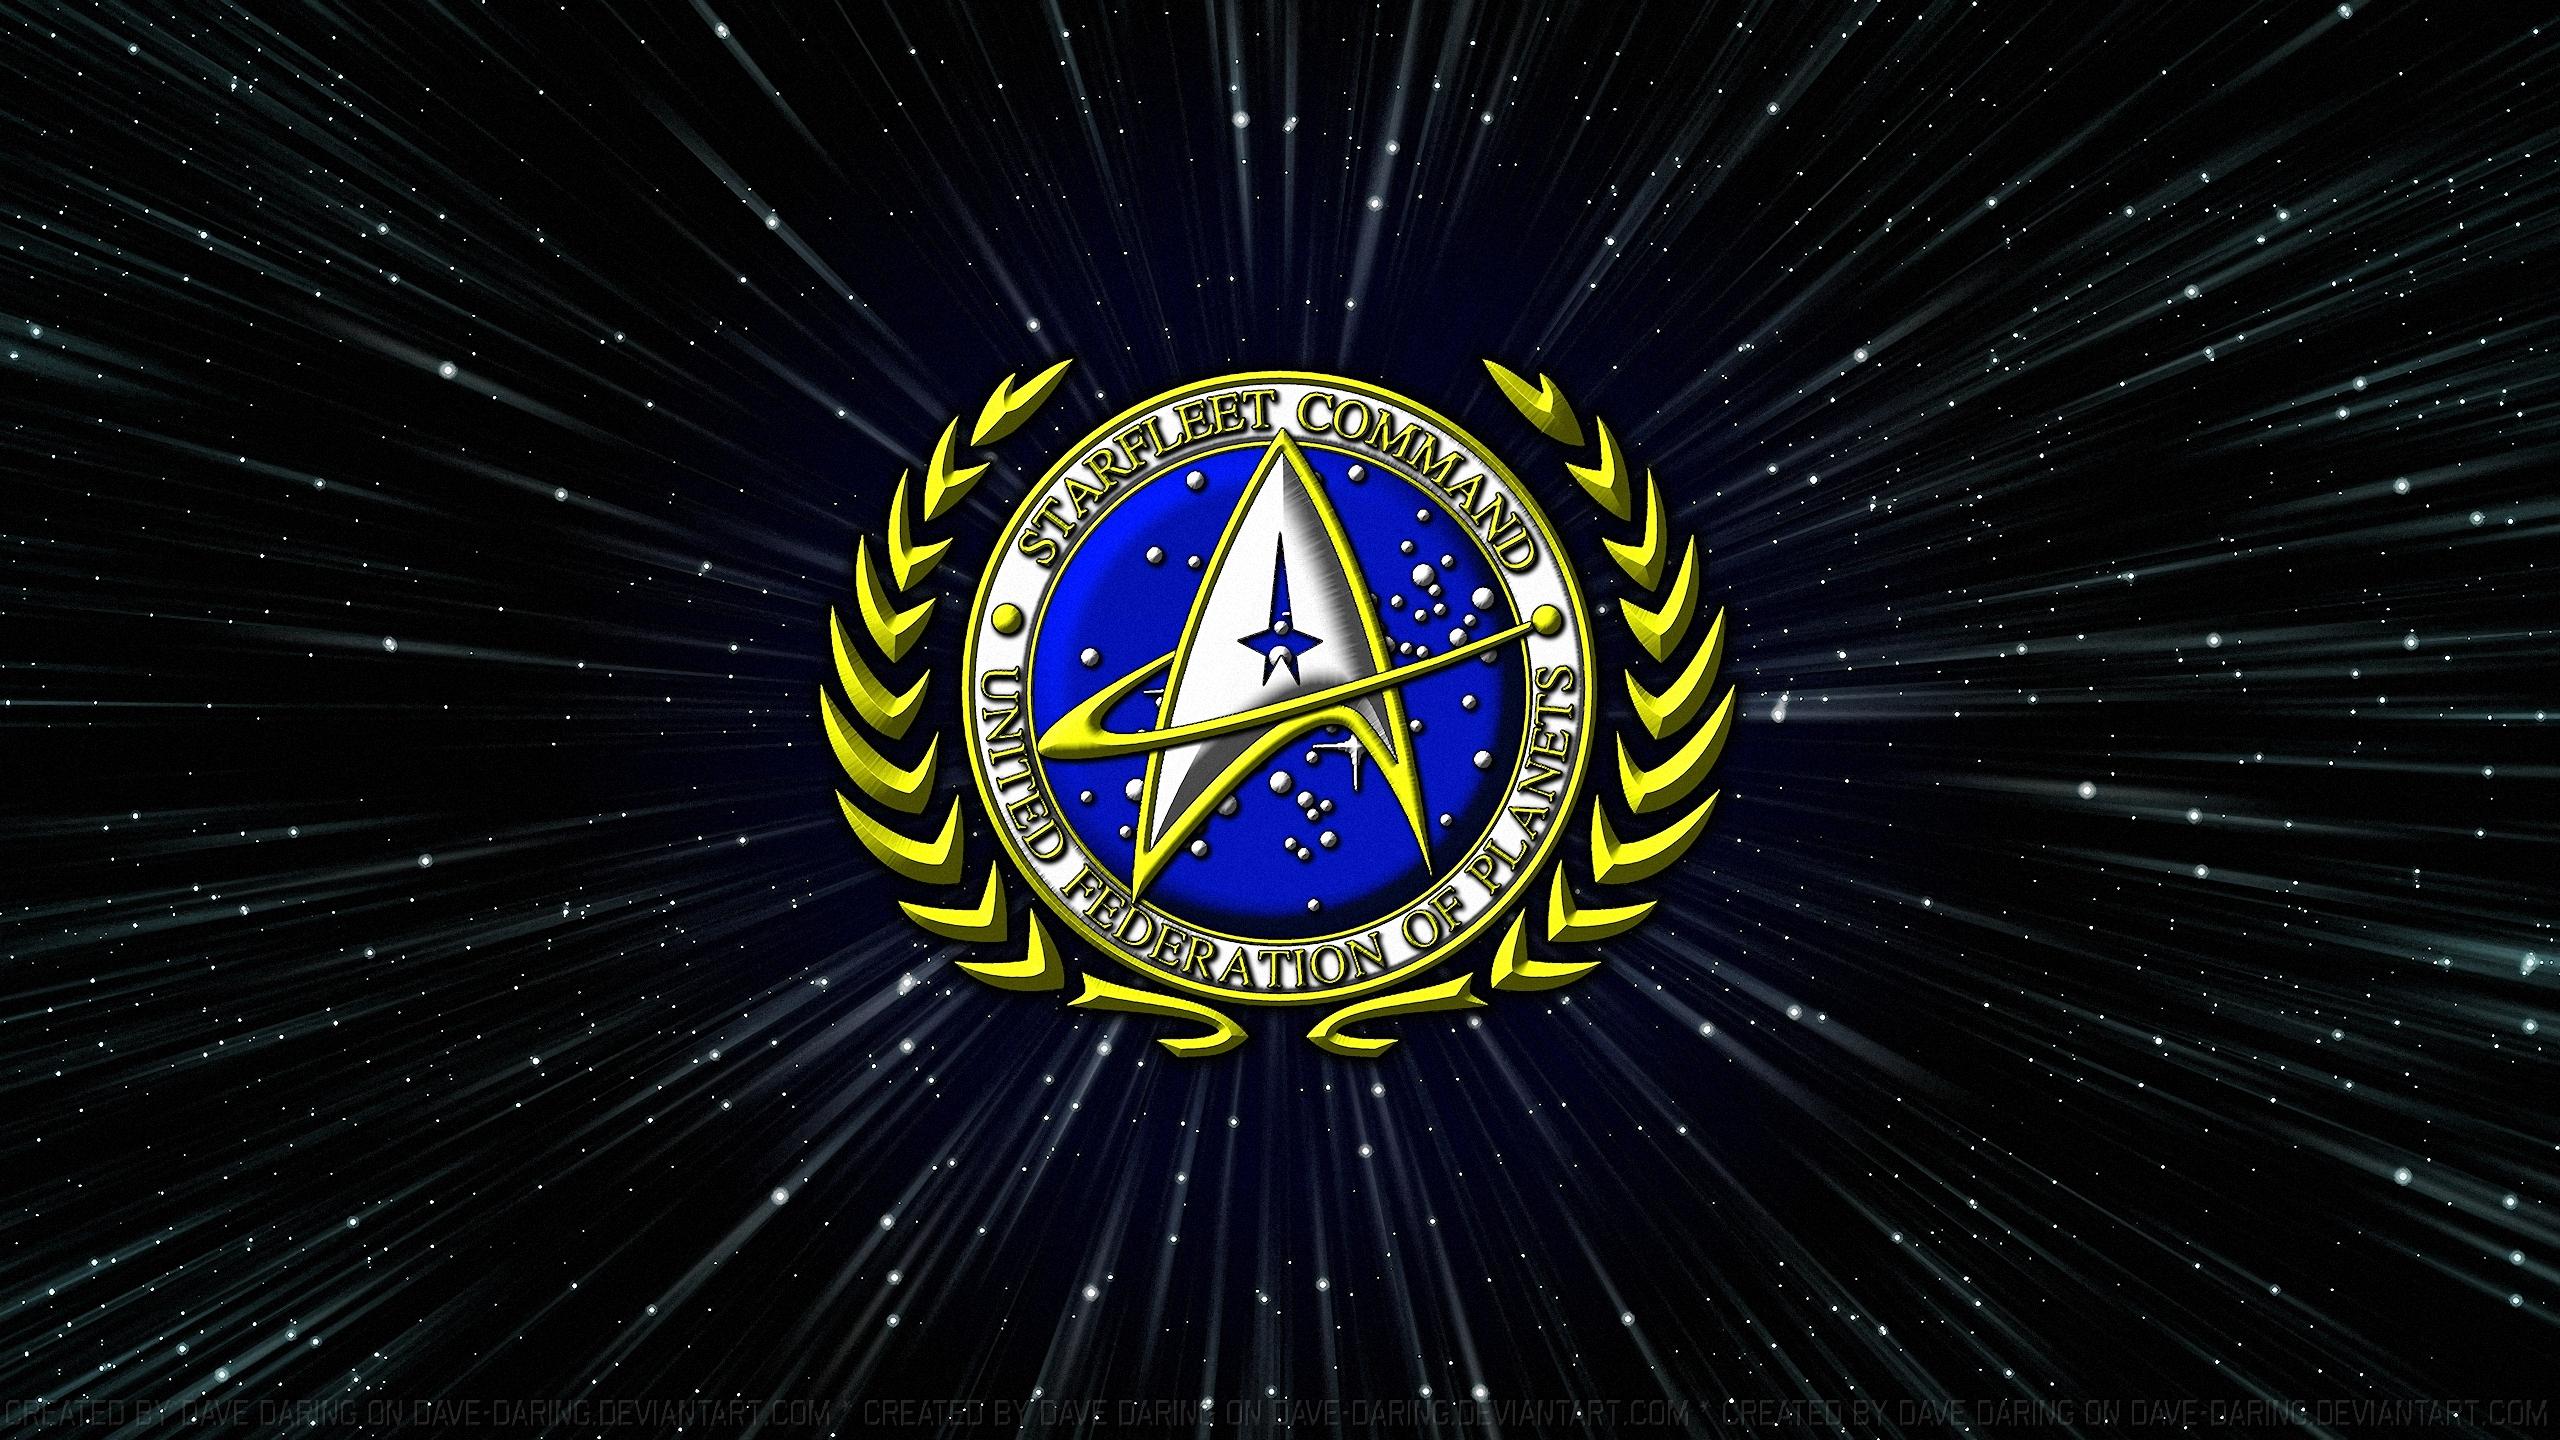 star trek starfleet command wallpaper - photo #5